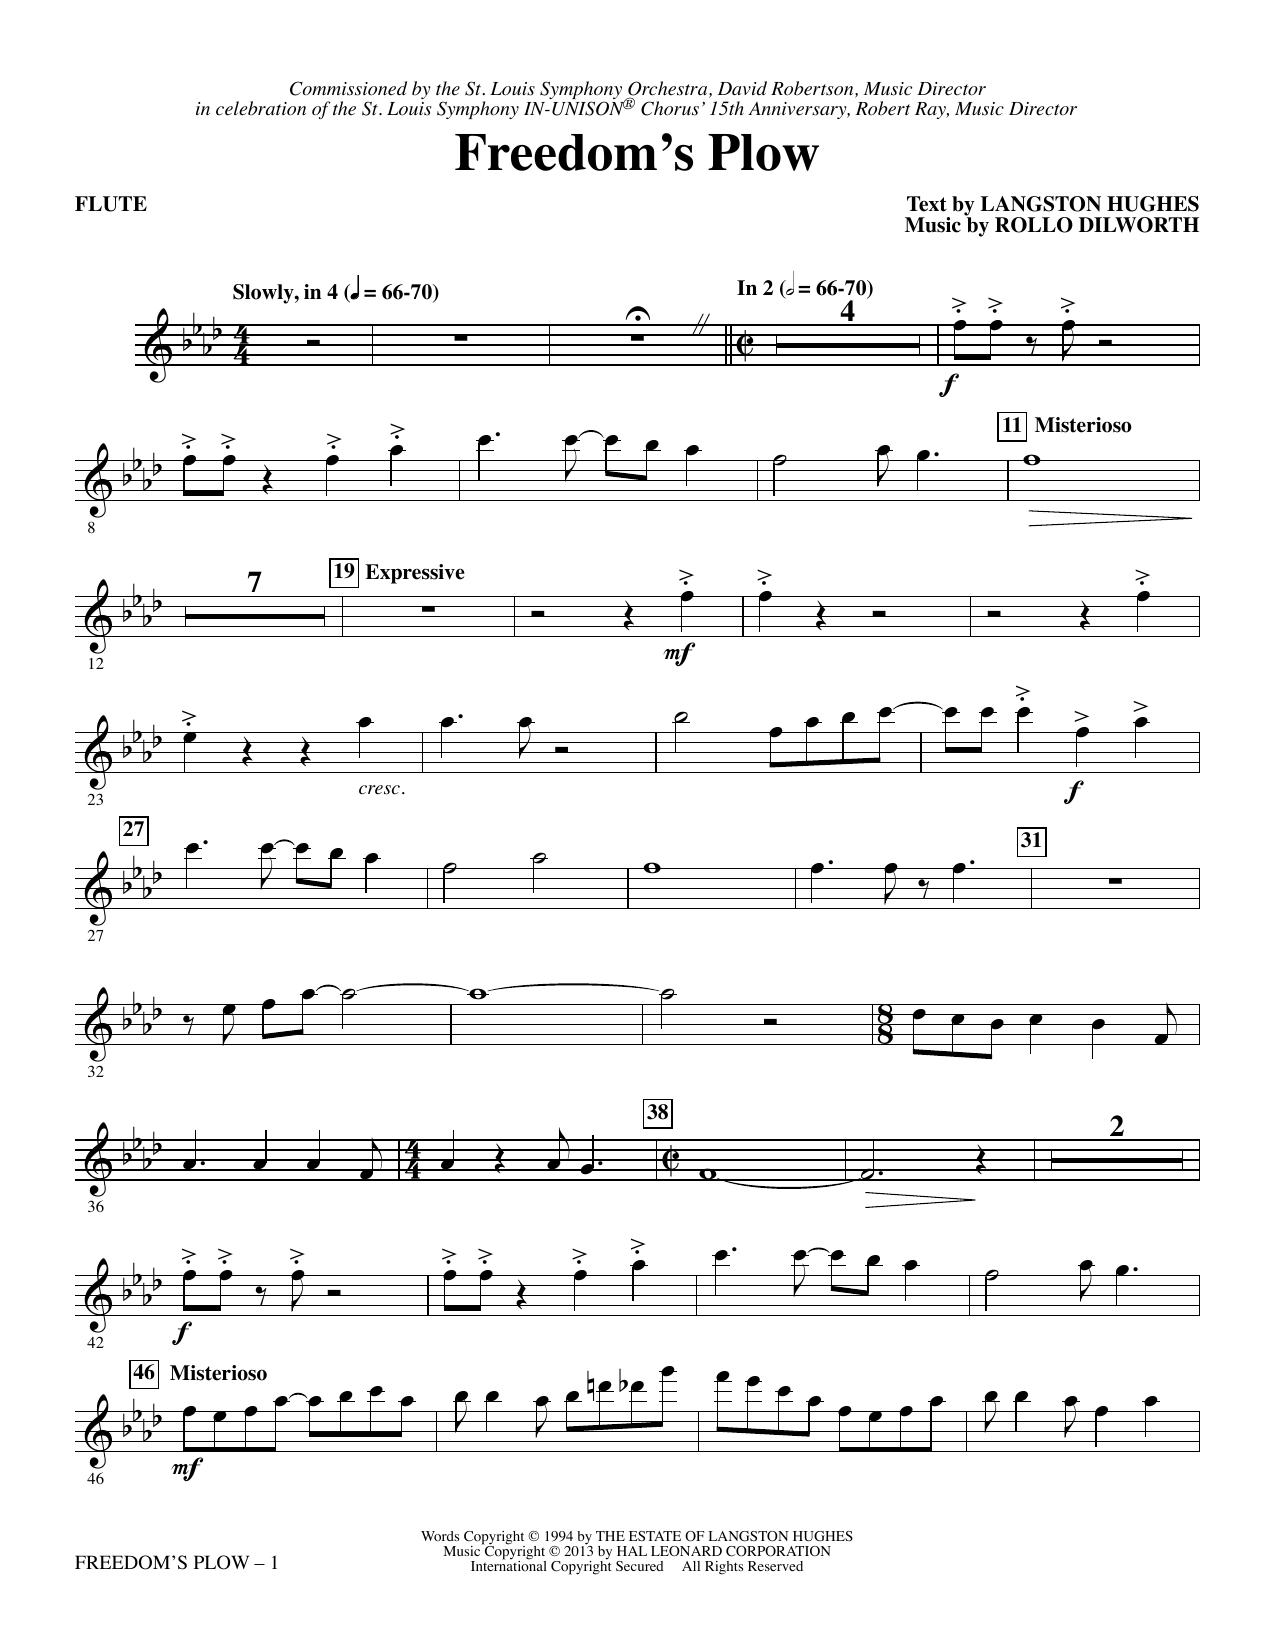 Freedom's Plow - Flute sheet music